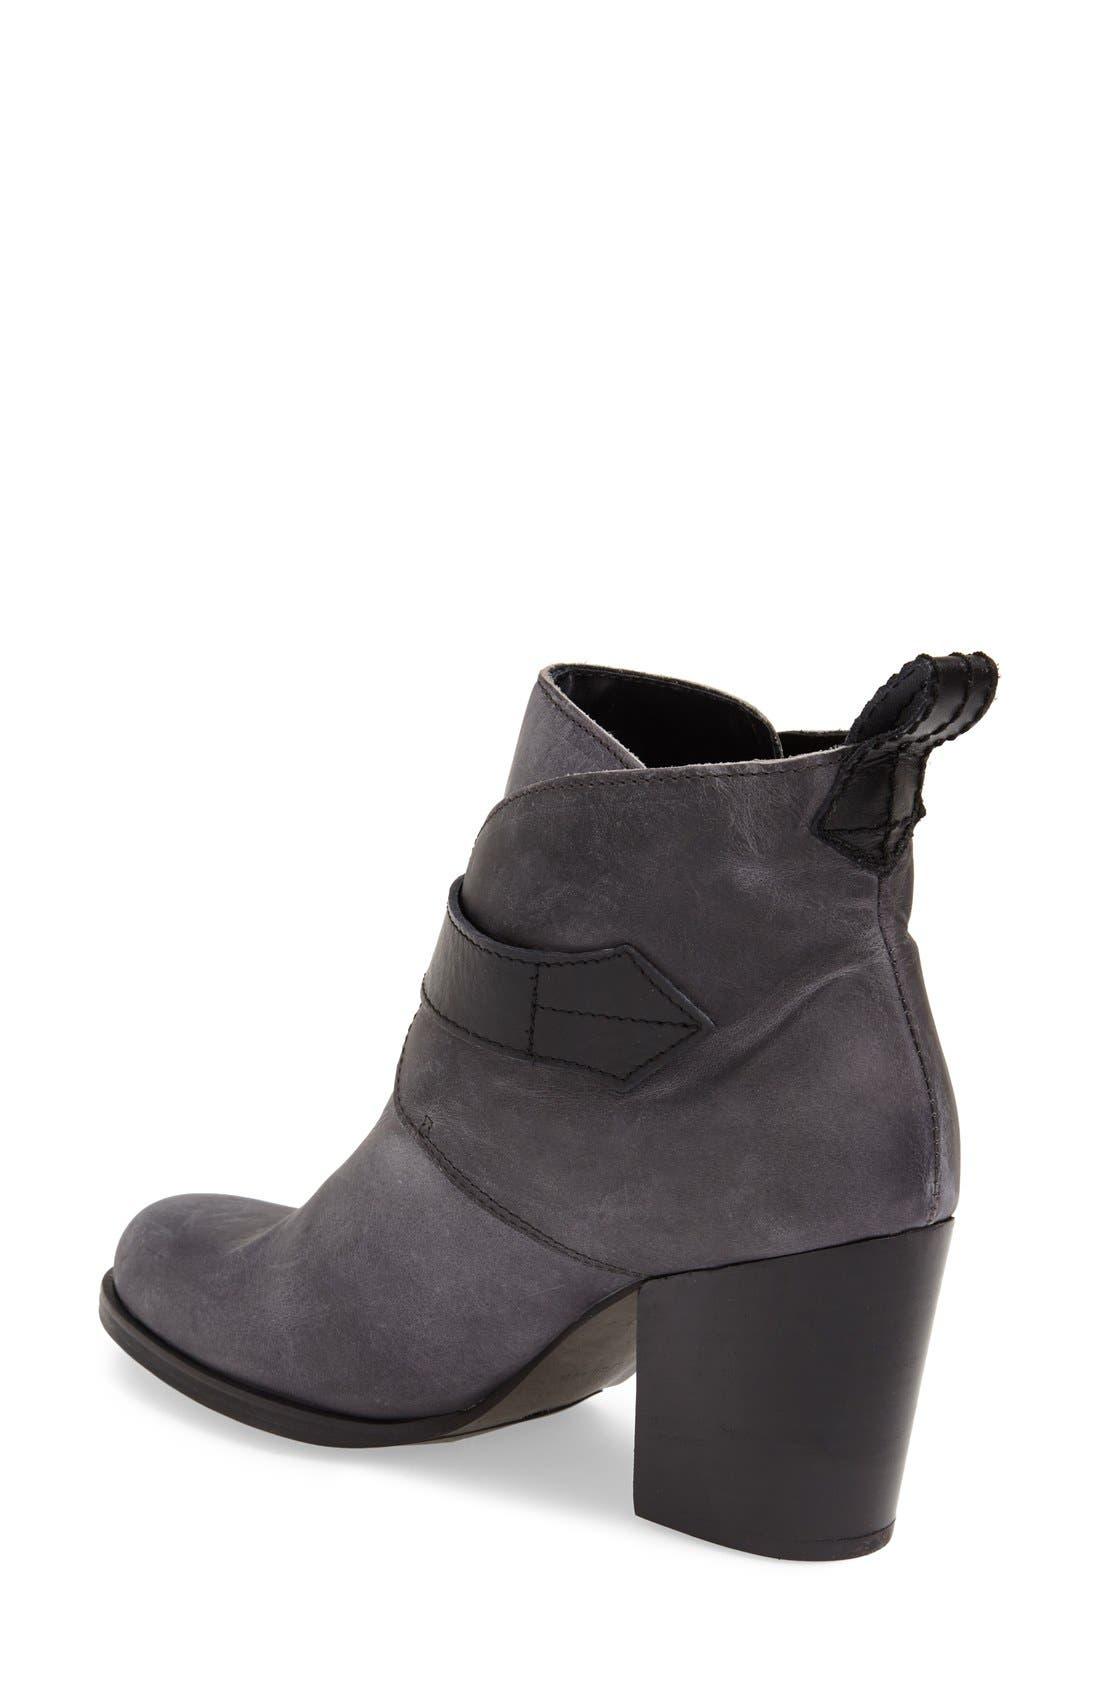 Alternate Image 2  - Charles David 'Celo' Ankle Boot (Women)